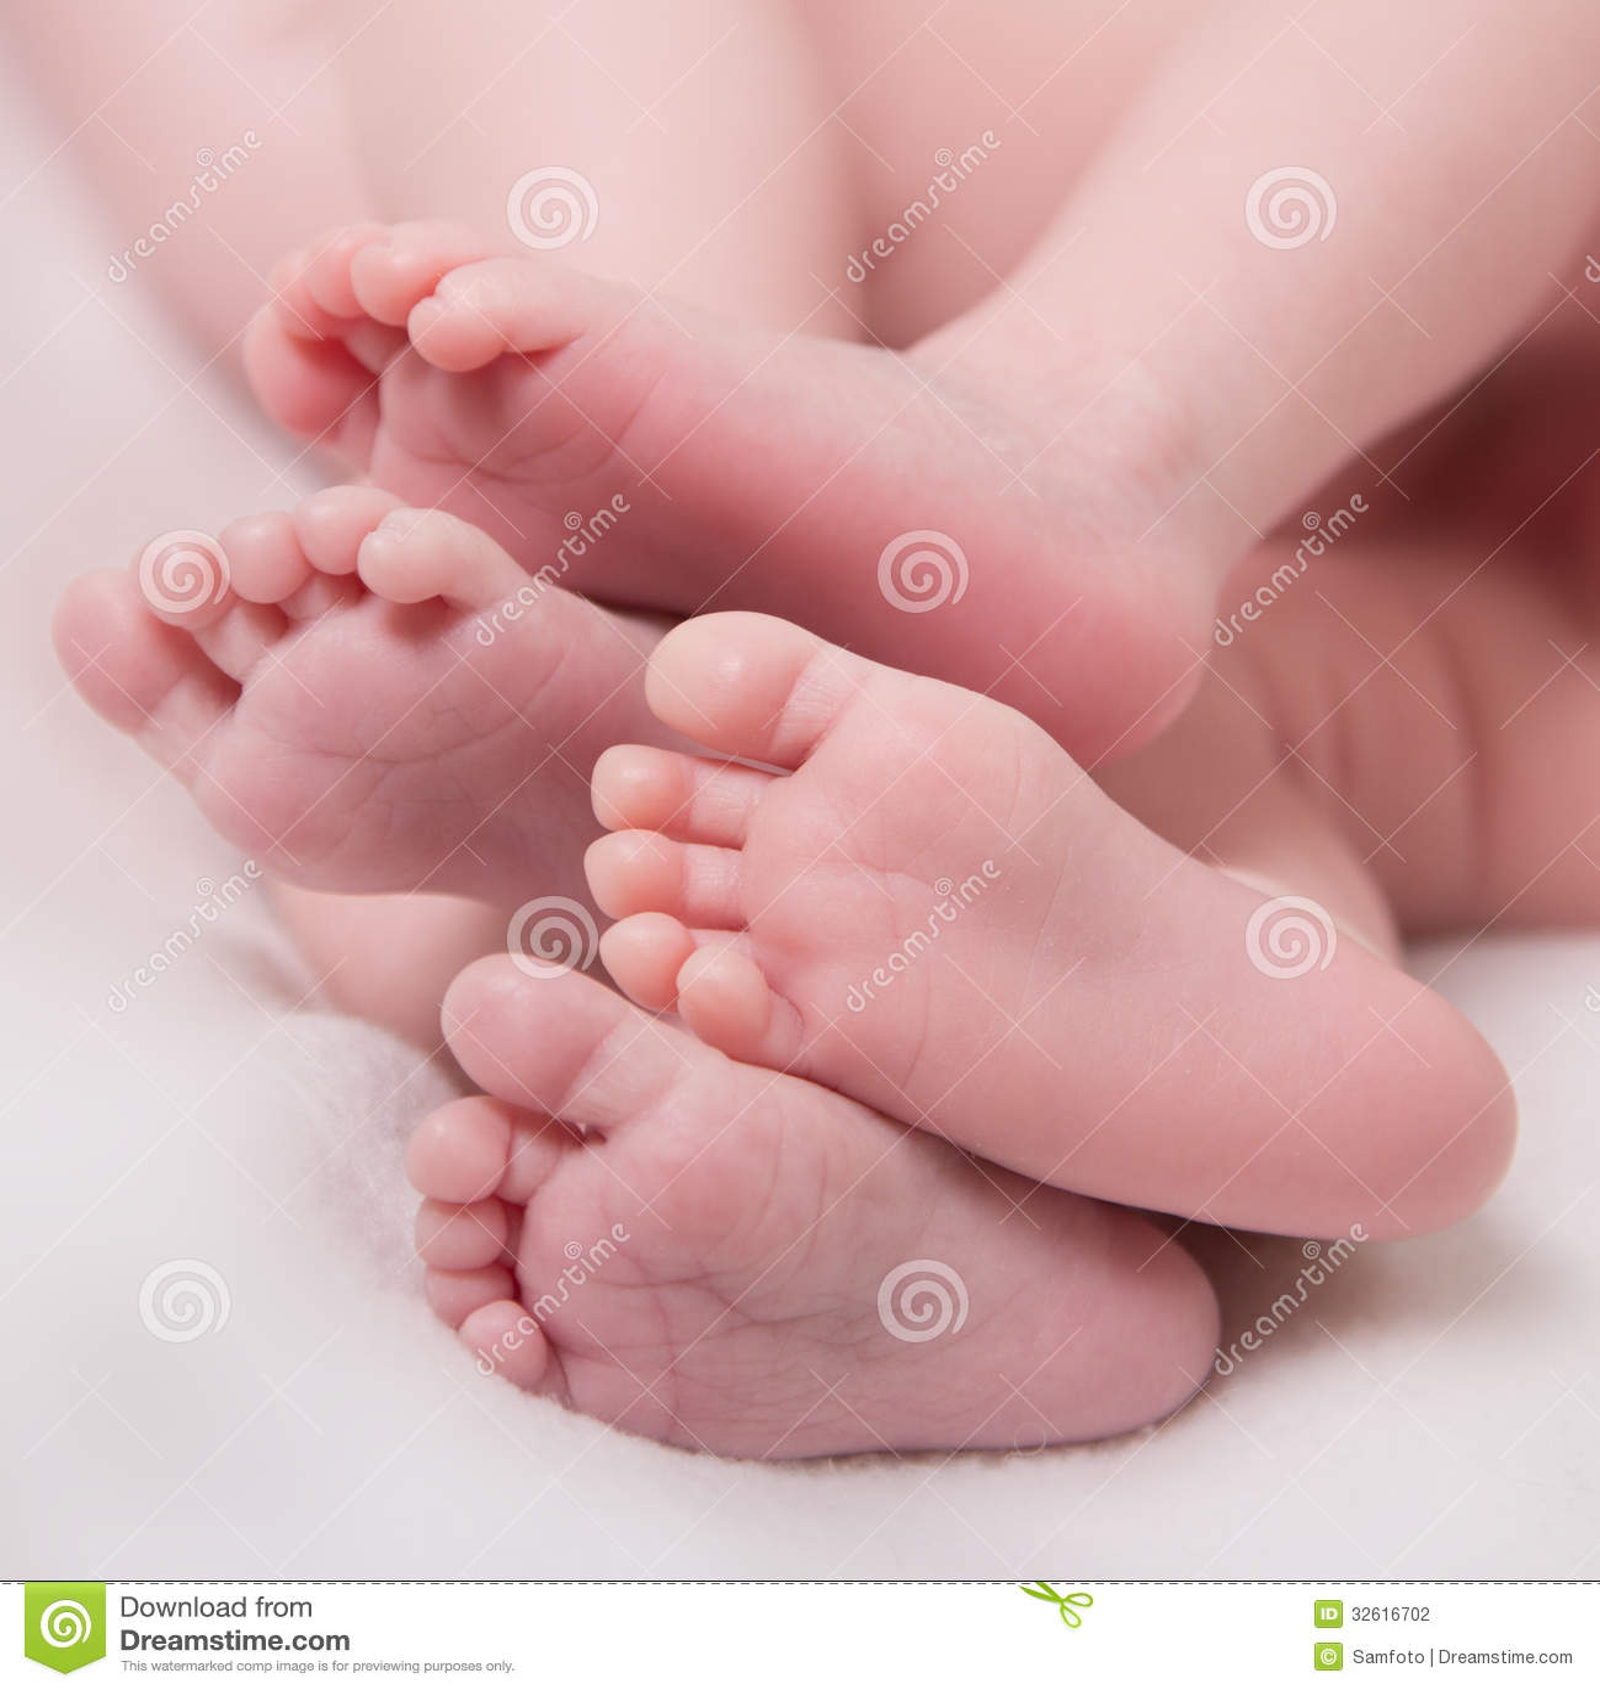 Twins Baby Feet Stock Photography Image 32616702